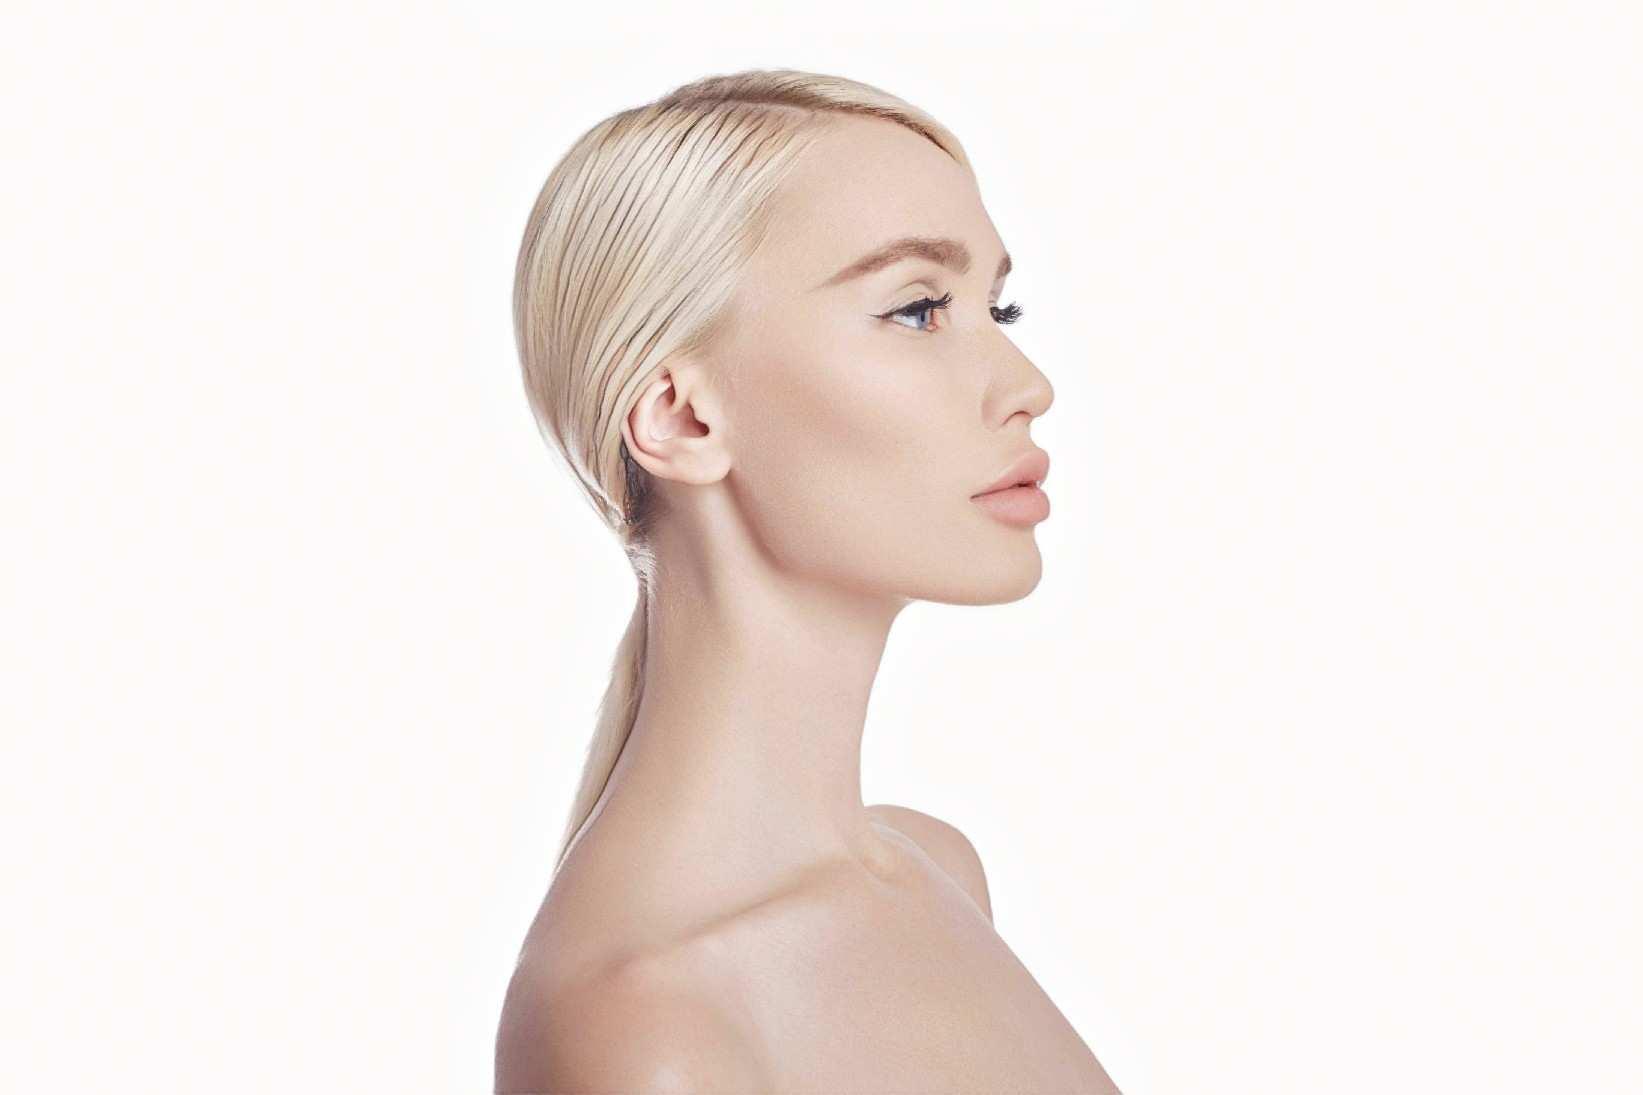 фото девушки после контурной пластики губ